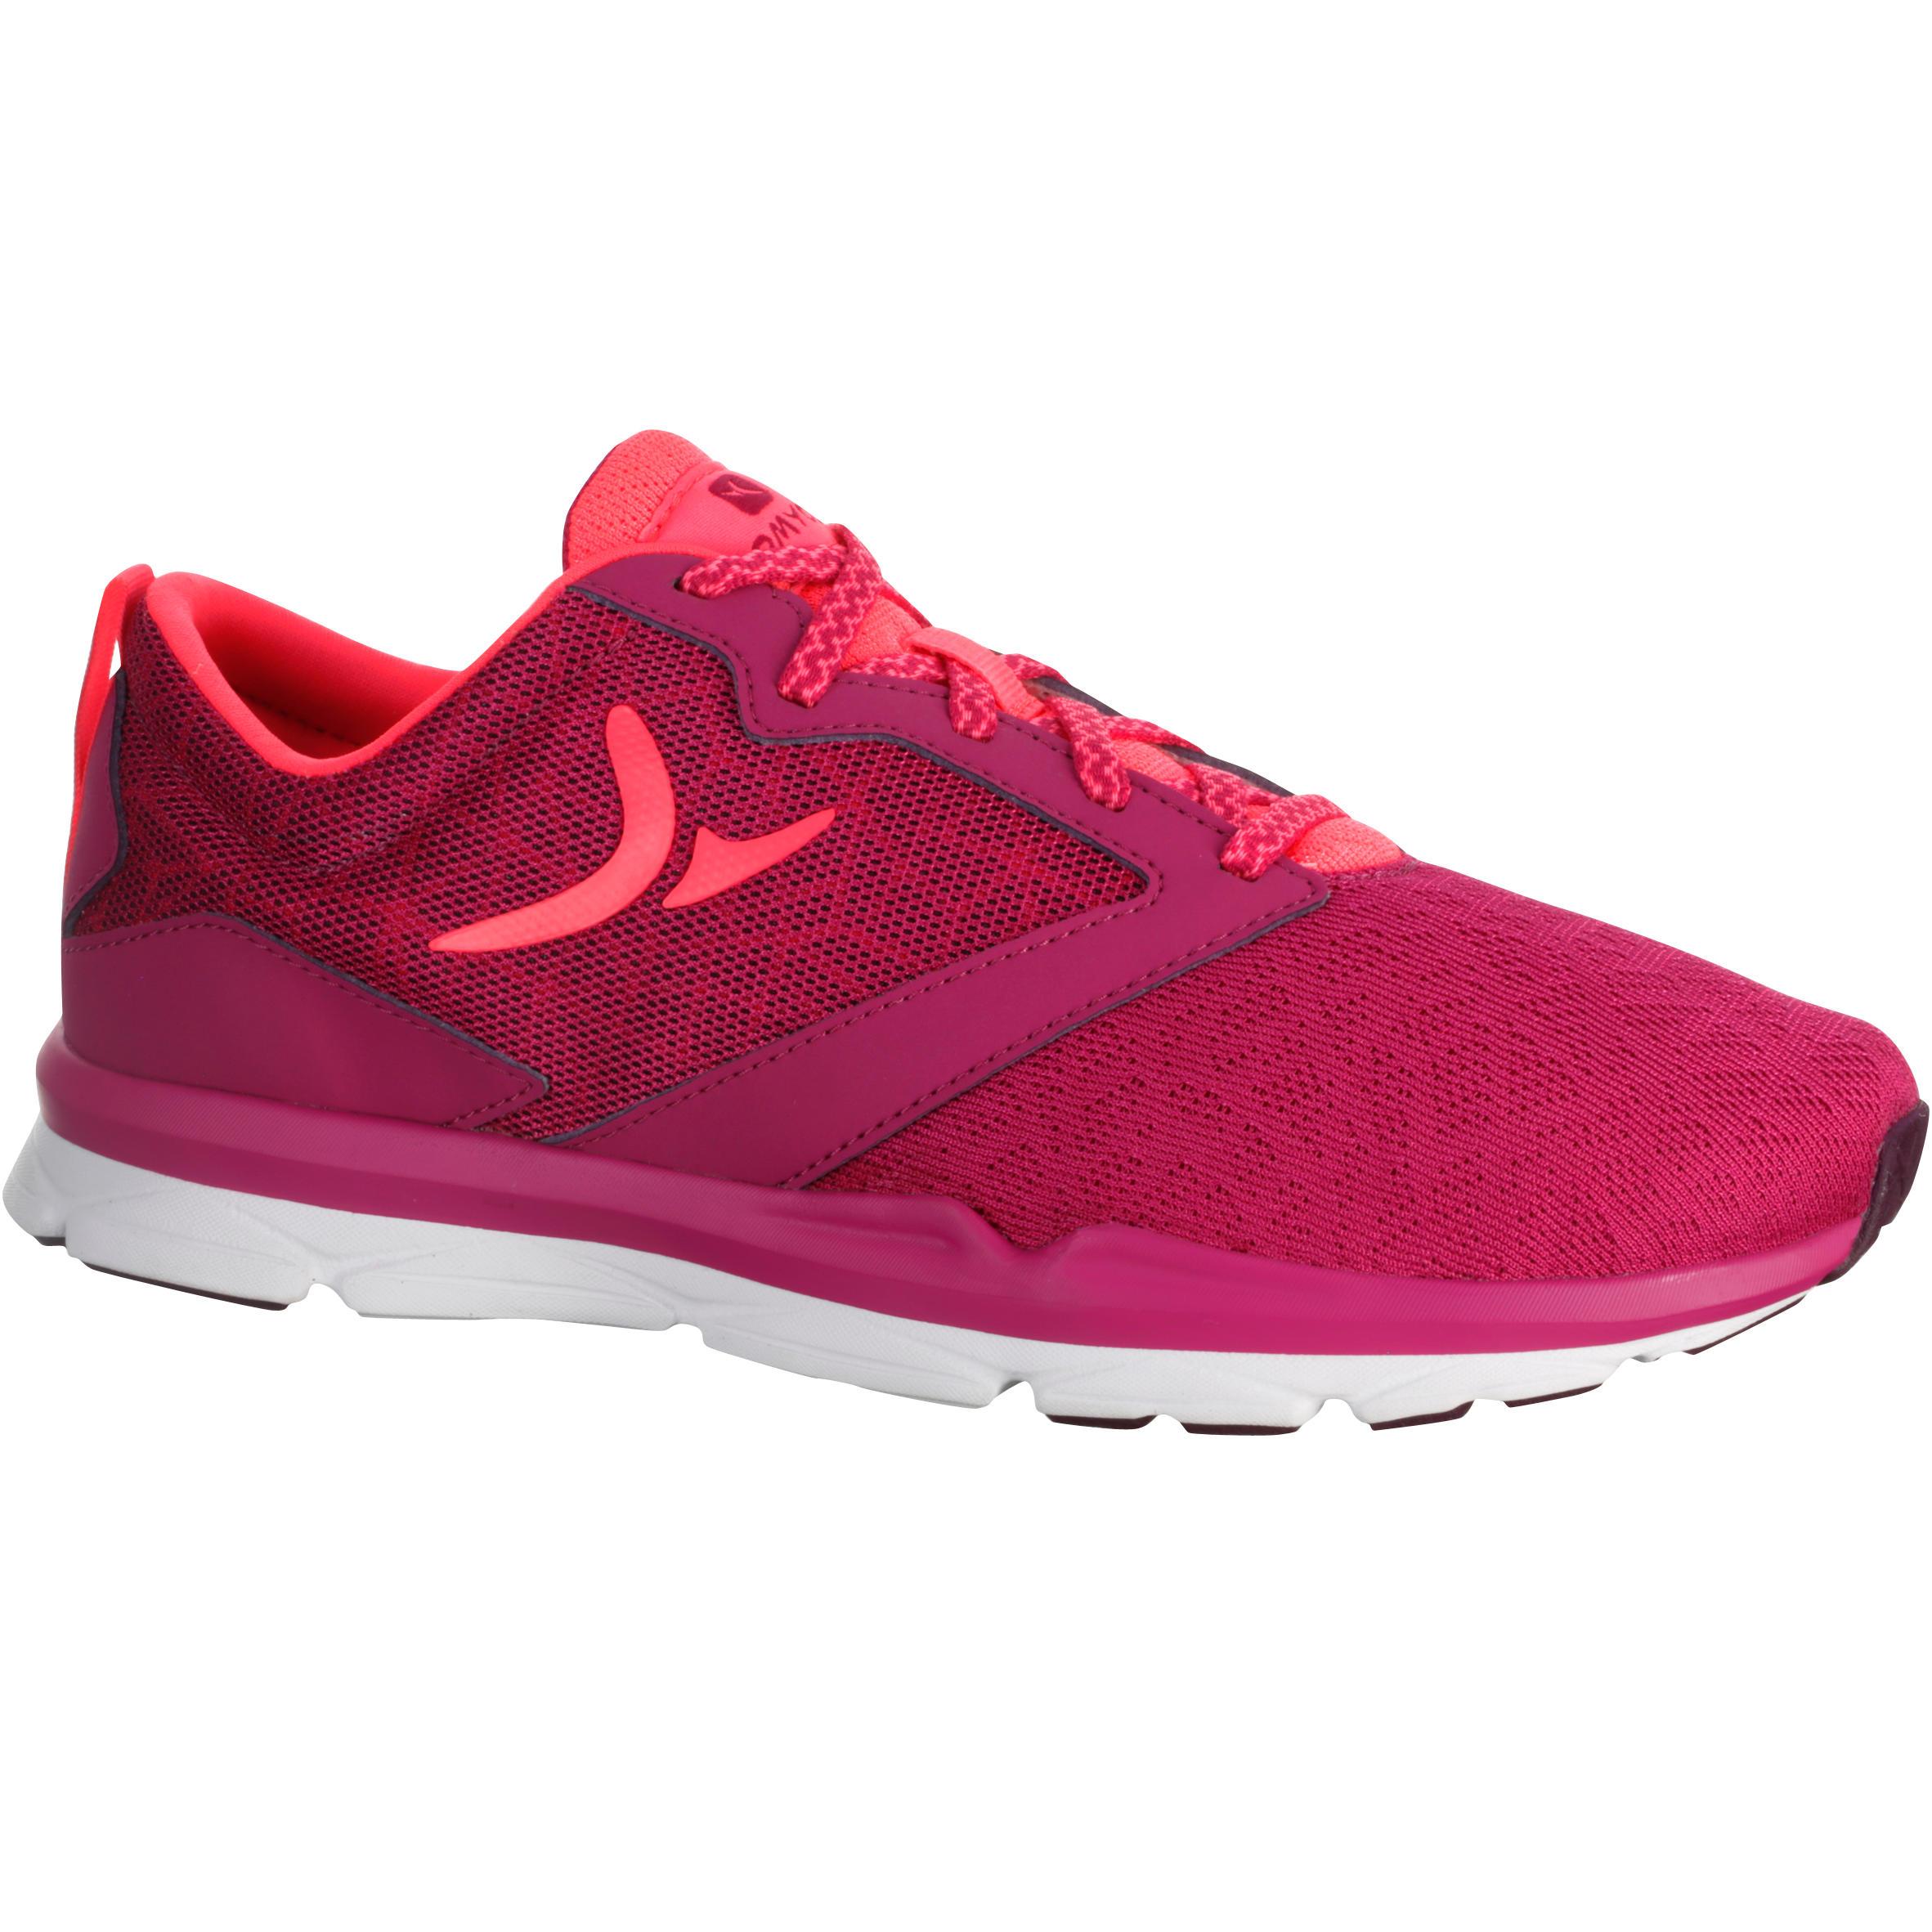 Tenis de fitness para mujer Energy + Rosa